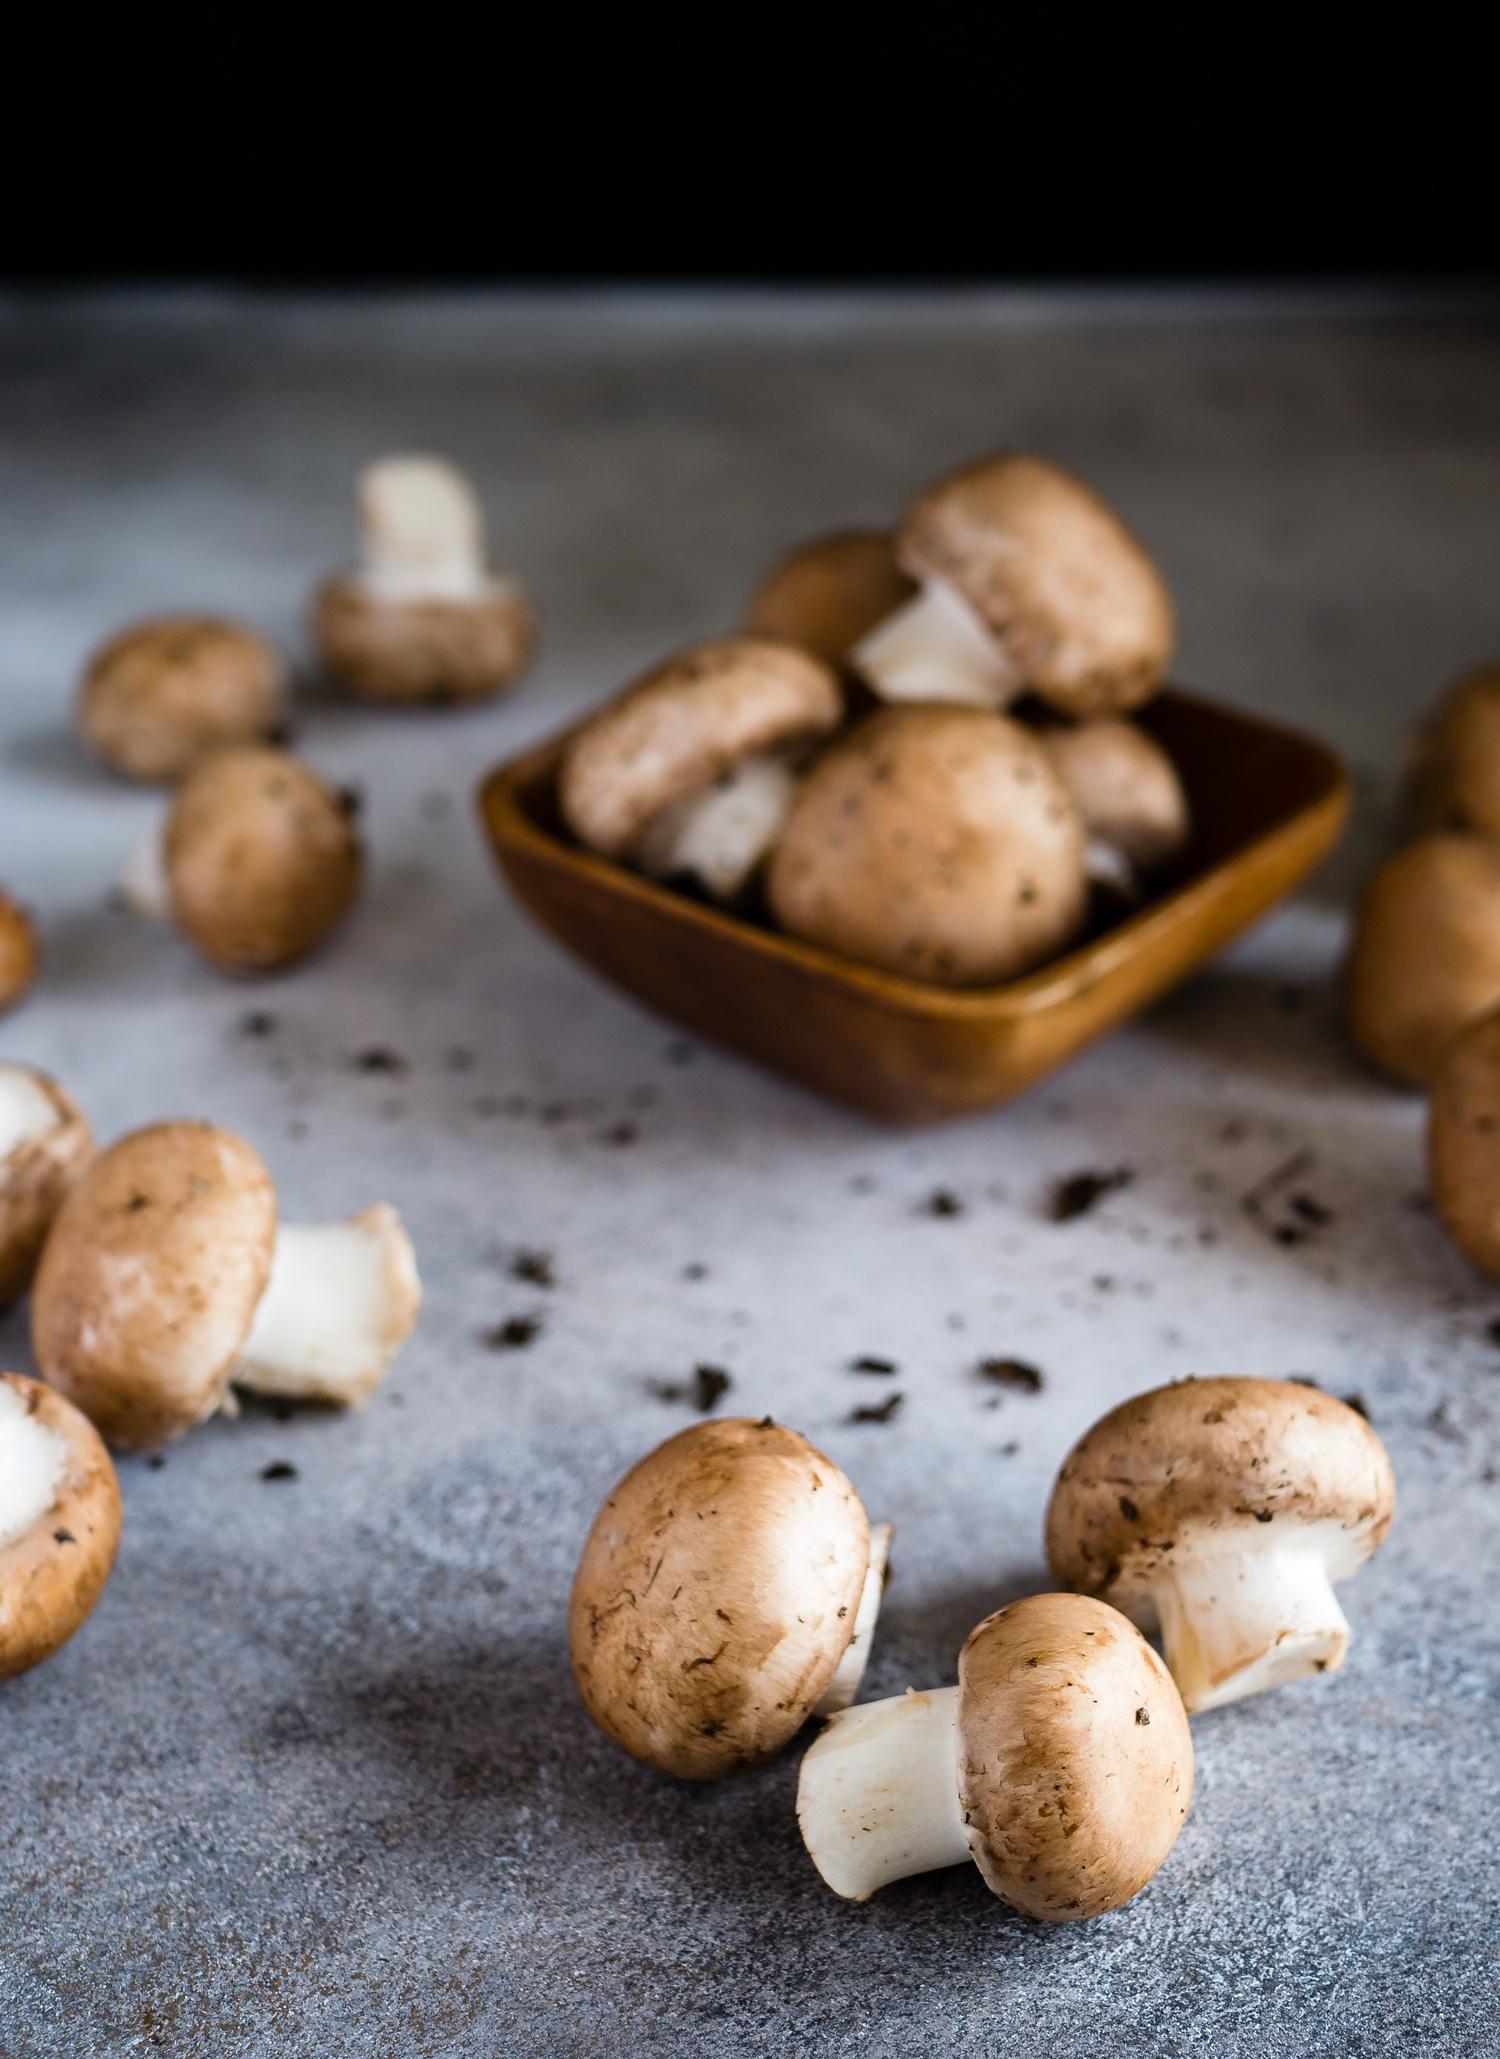 how_to_cook_mushrooms_quick_vegan_recipes_for_mushrooms_health_benefits_of_mushrooms.jpg